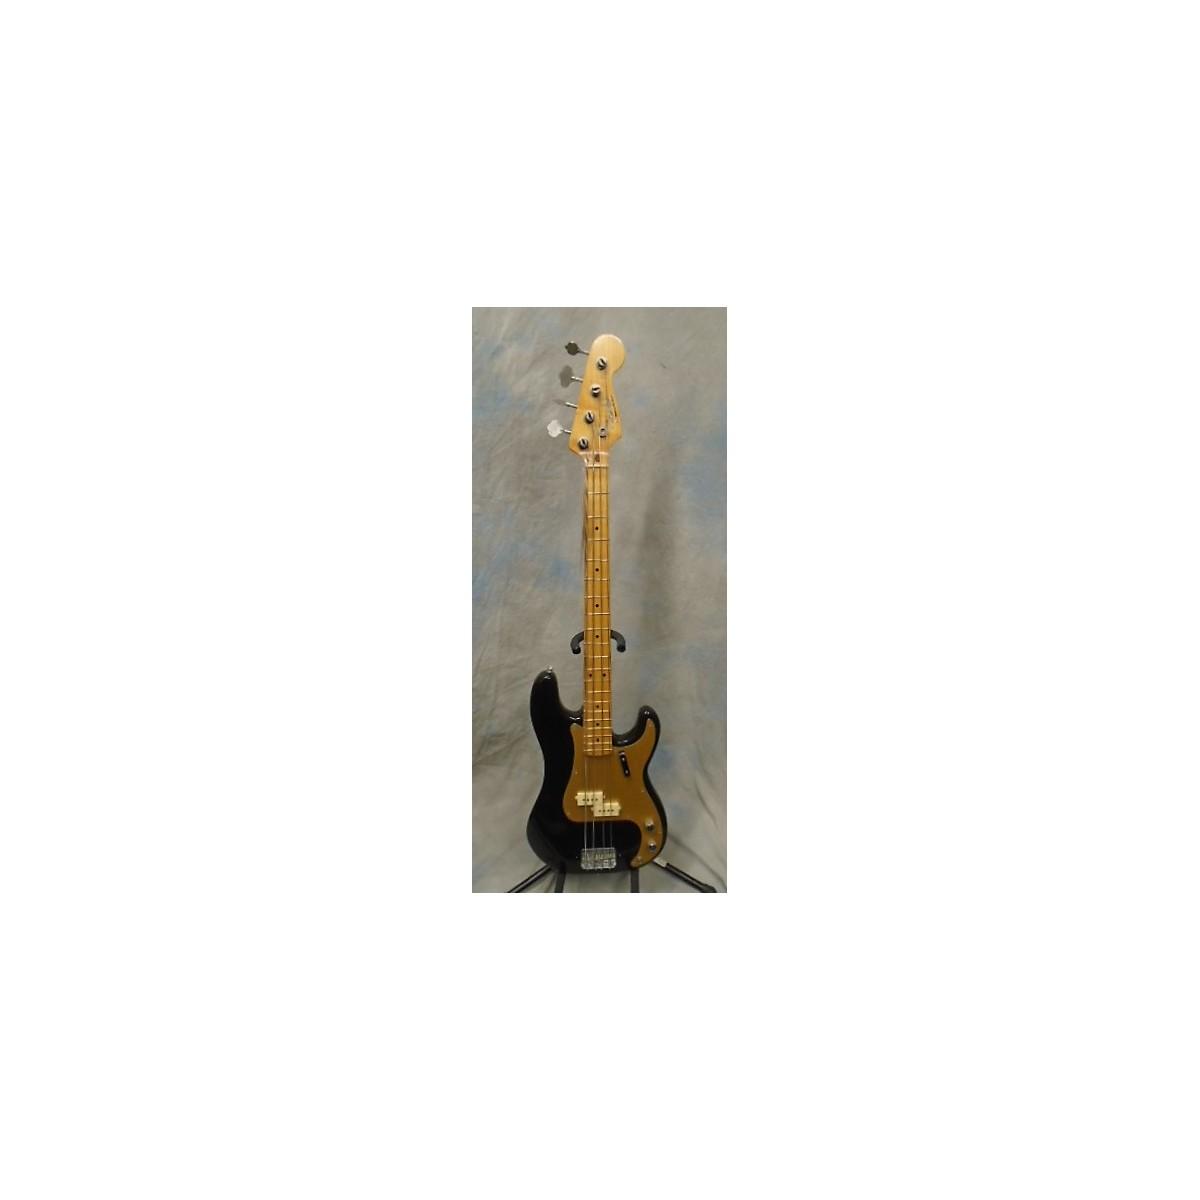 Fender 1982 1957 Reissue Precision Bass Electric Bass Guitar